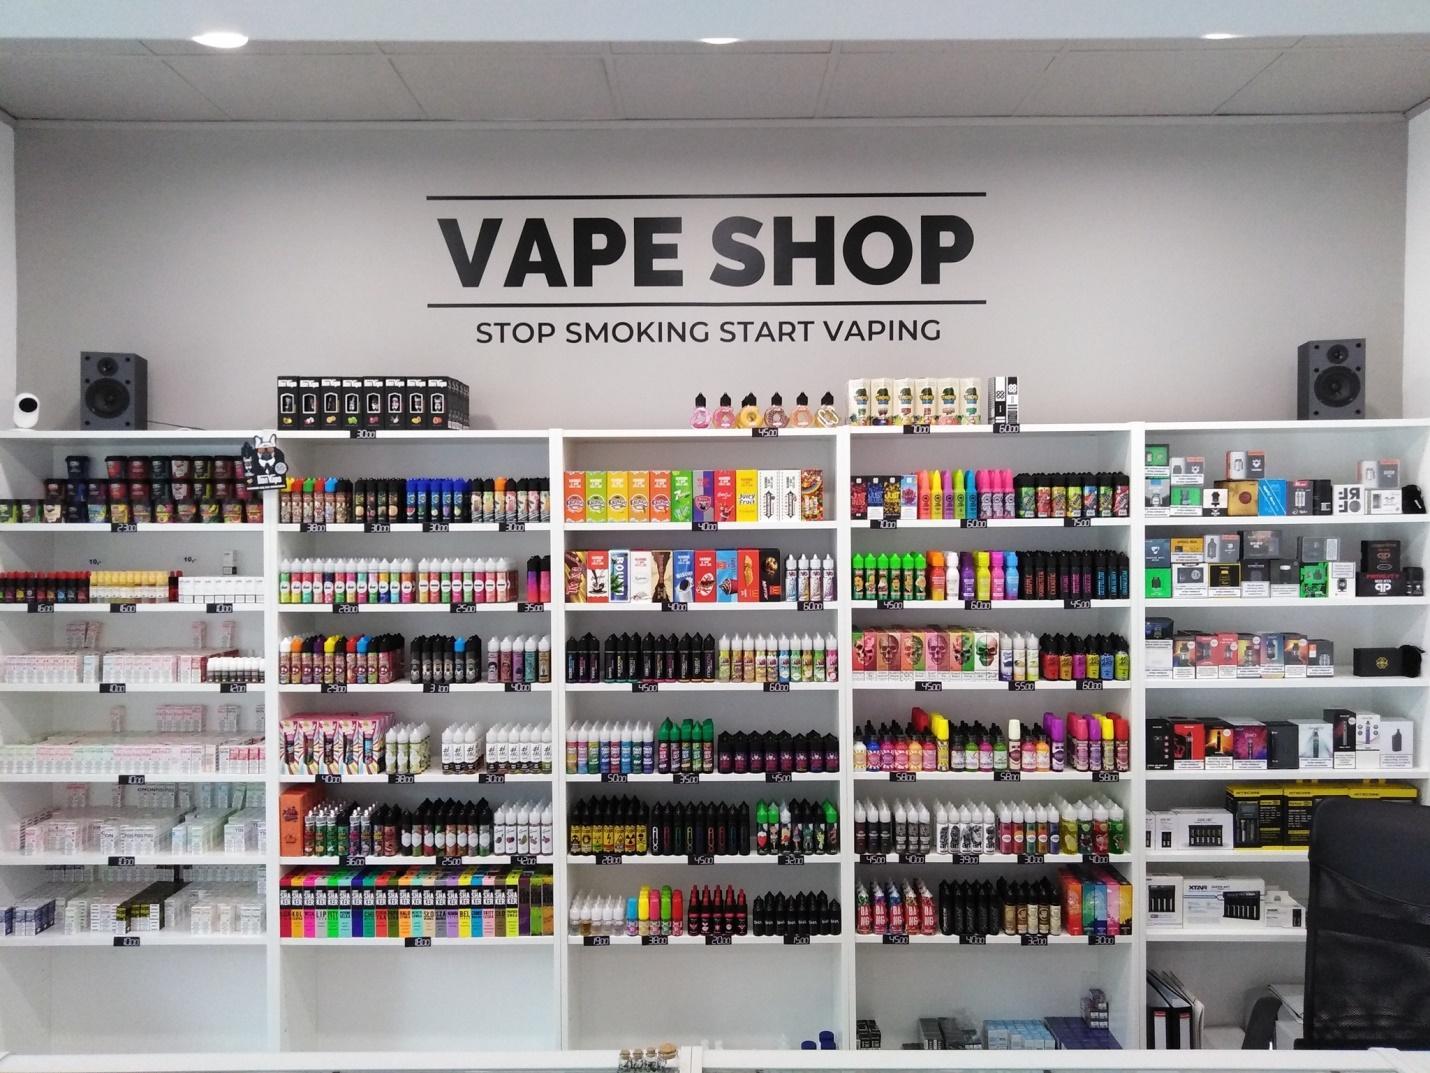 Best online vape store in 2020 - Top 10 vape shop list • VAPE HK